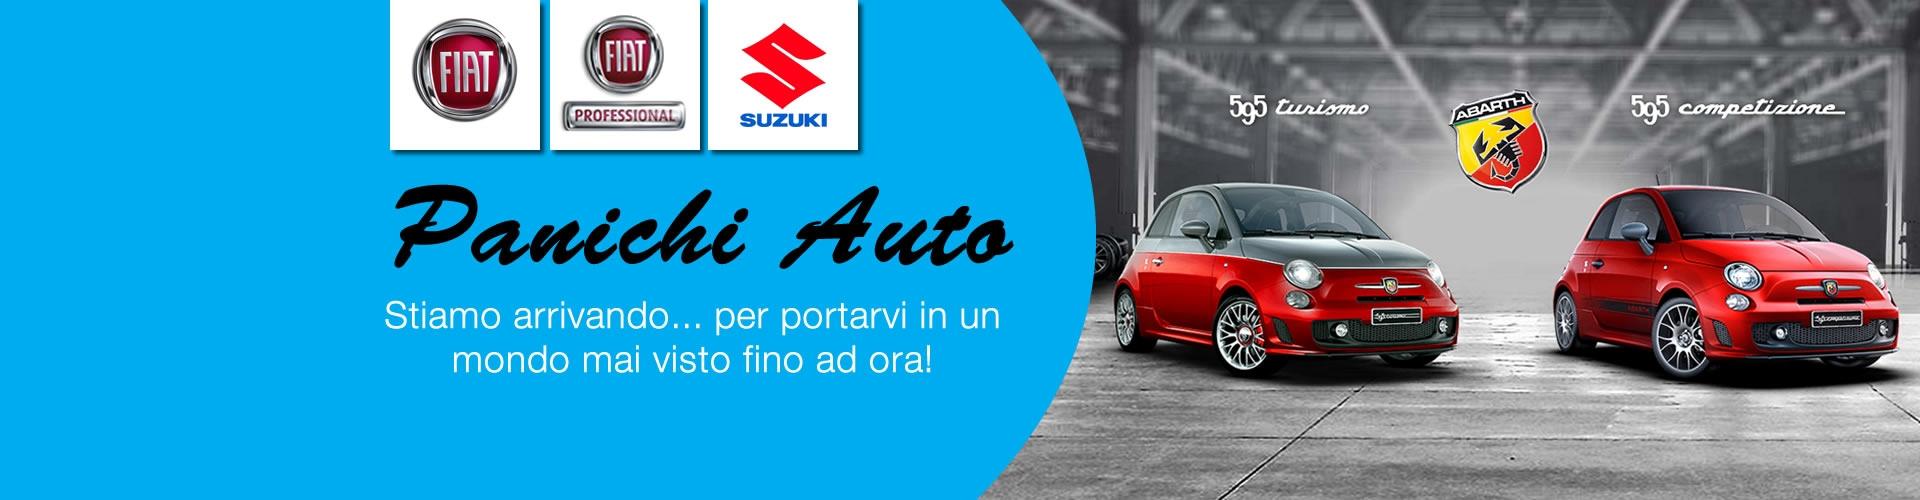 Panichi_Auto_Cortona